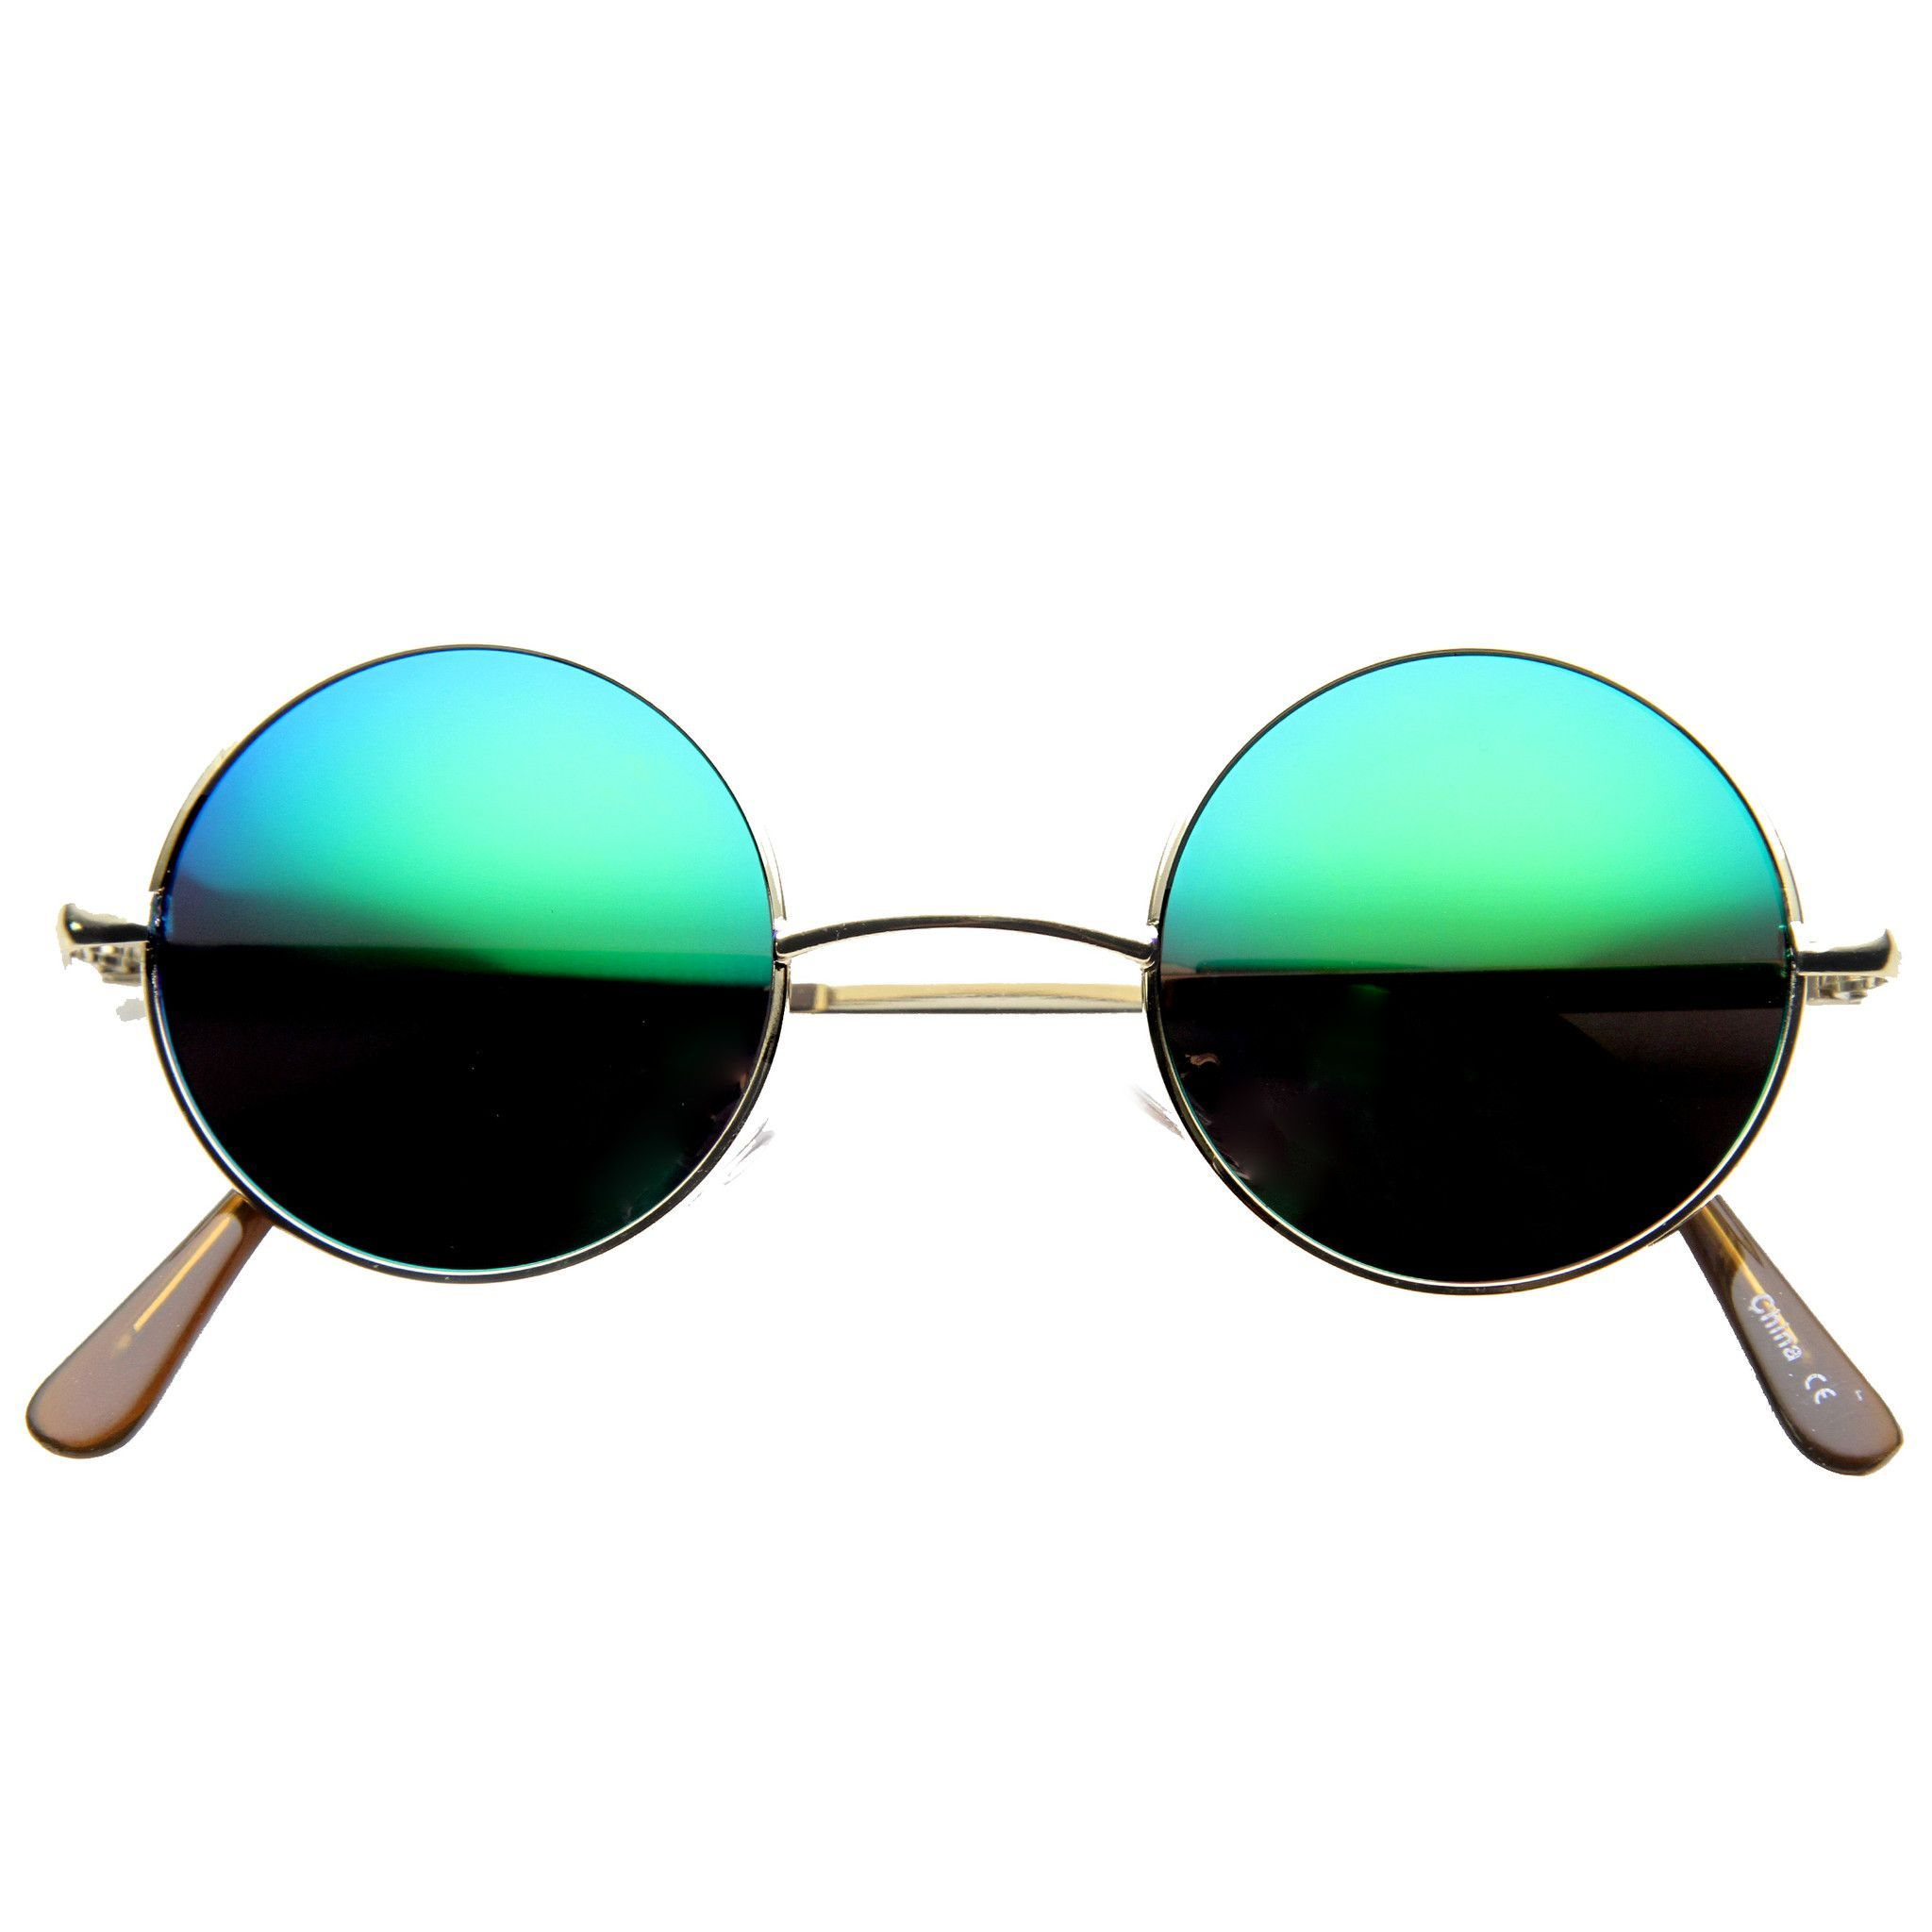 5d9db623cb Retro Lennon Style Round Circle Metal Mirror Lens Sunglasses 1408 ...